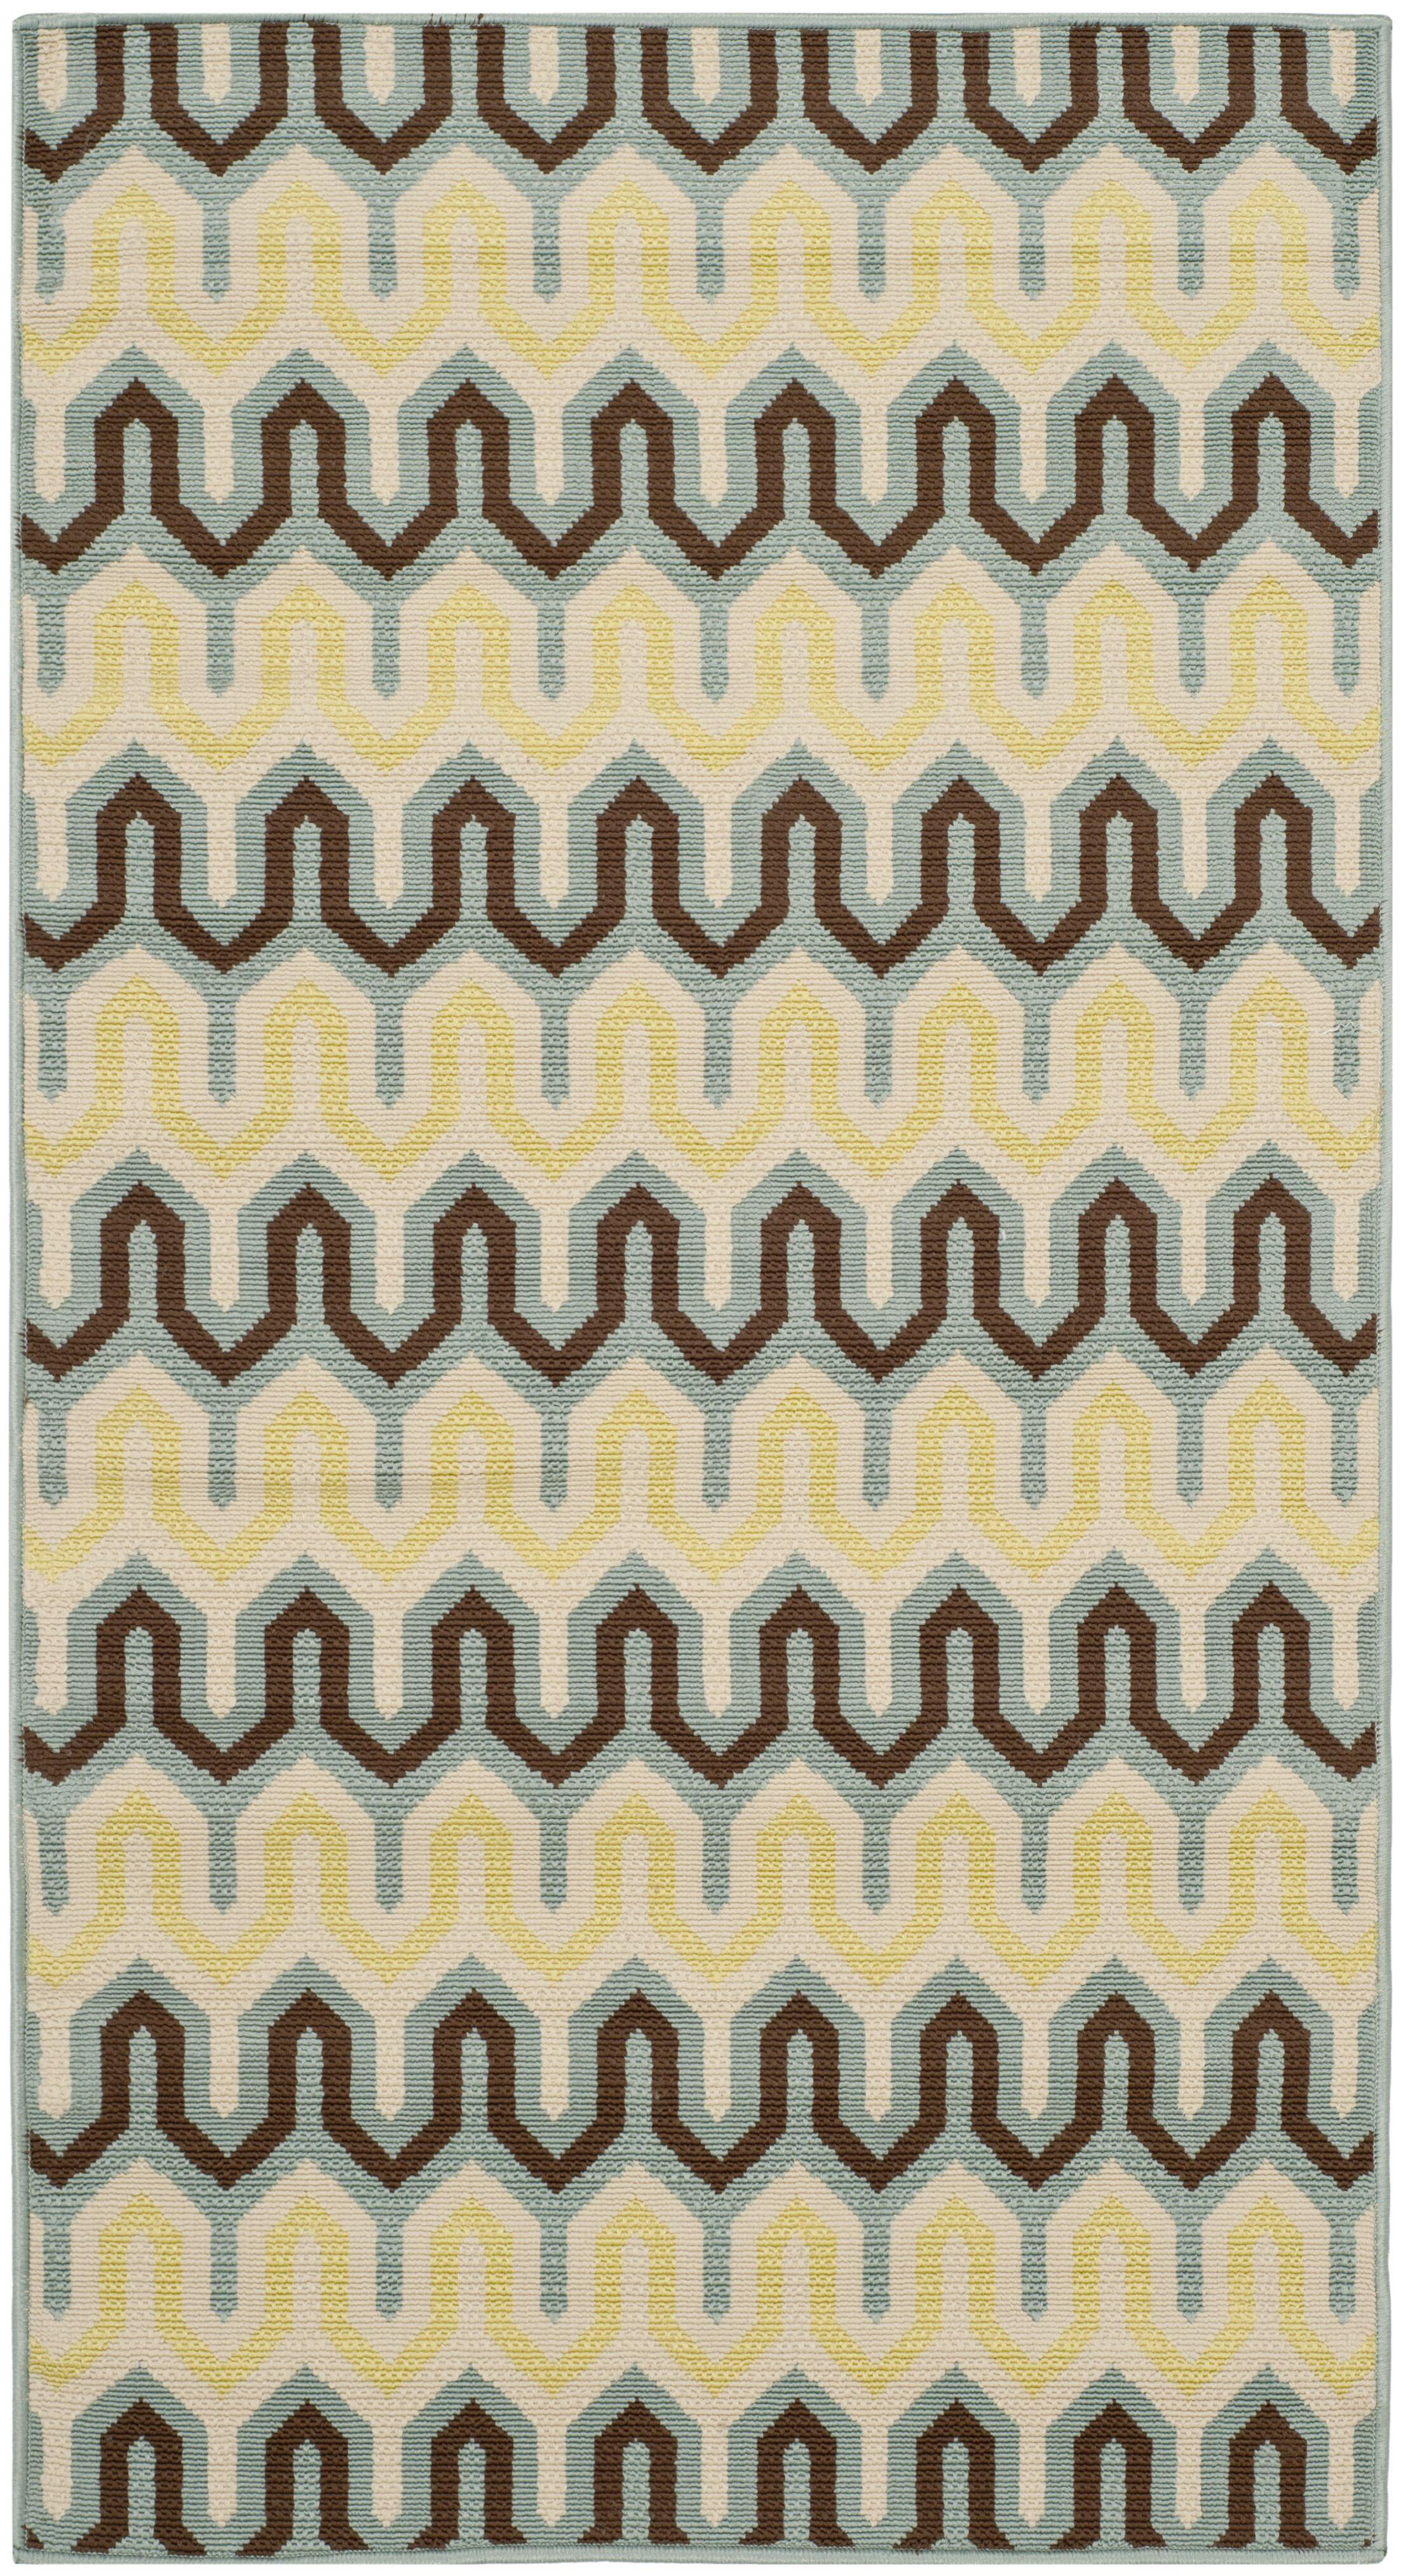 Kelston Light Ivory Outdoor Area Rug Rug Size: Rectangle 4' x 6'